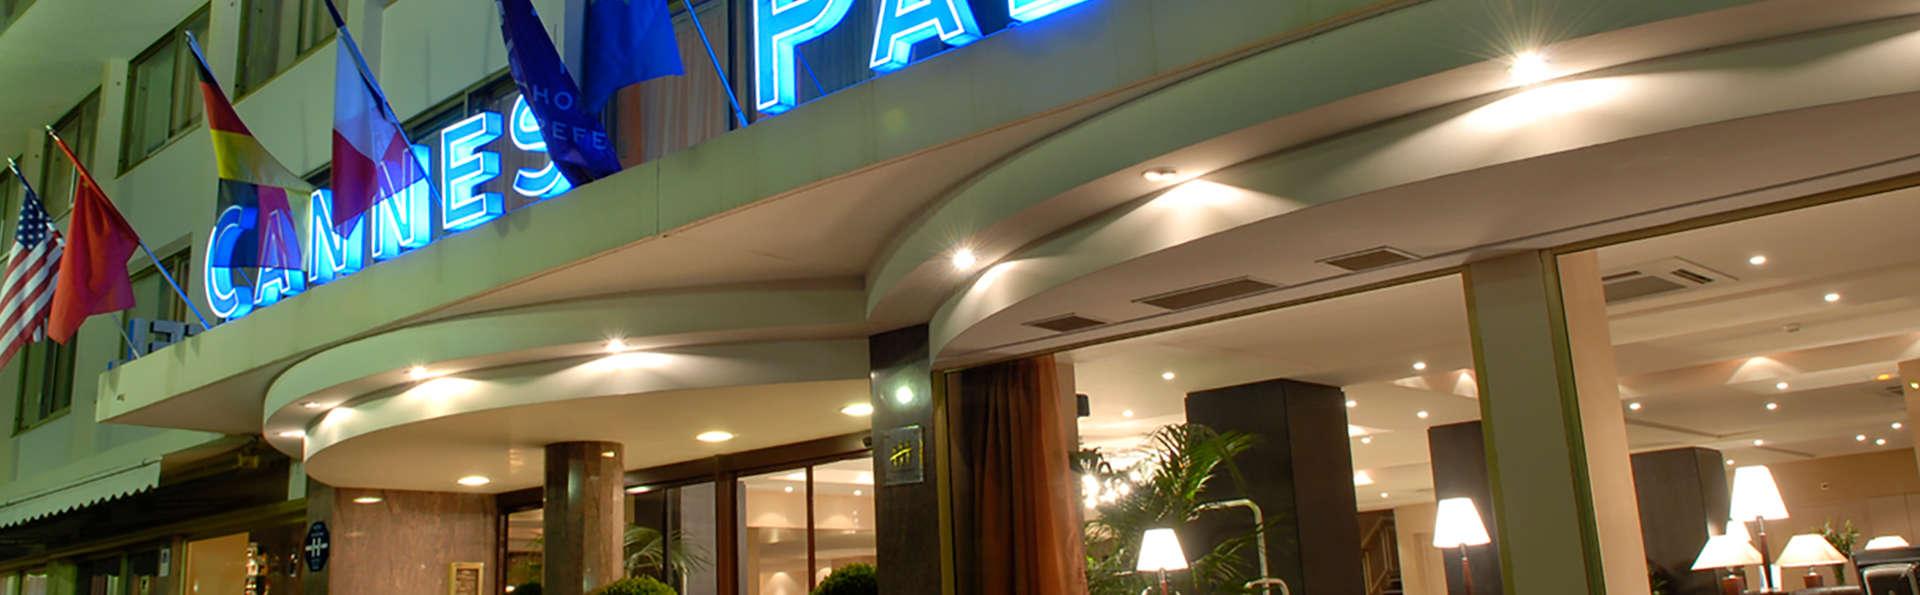 Le Cannes Palace - Edit_Front.jpg